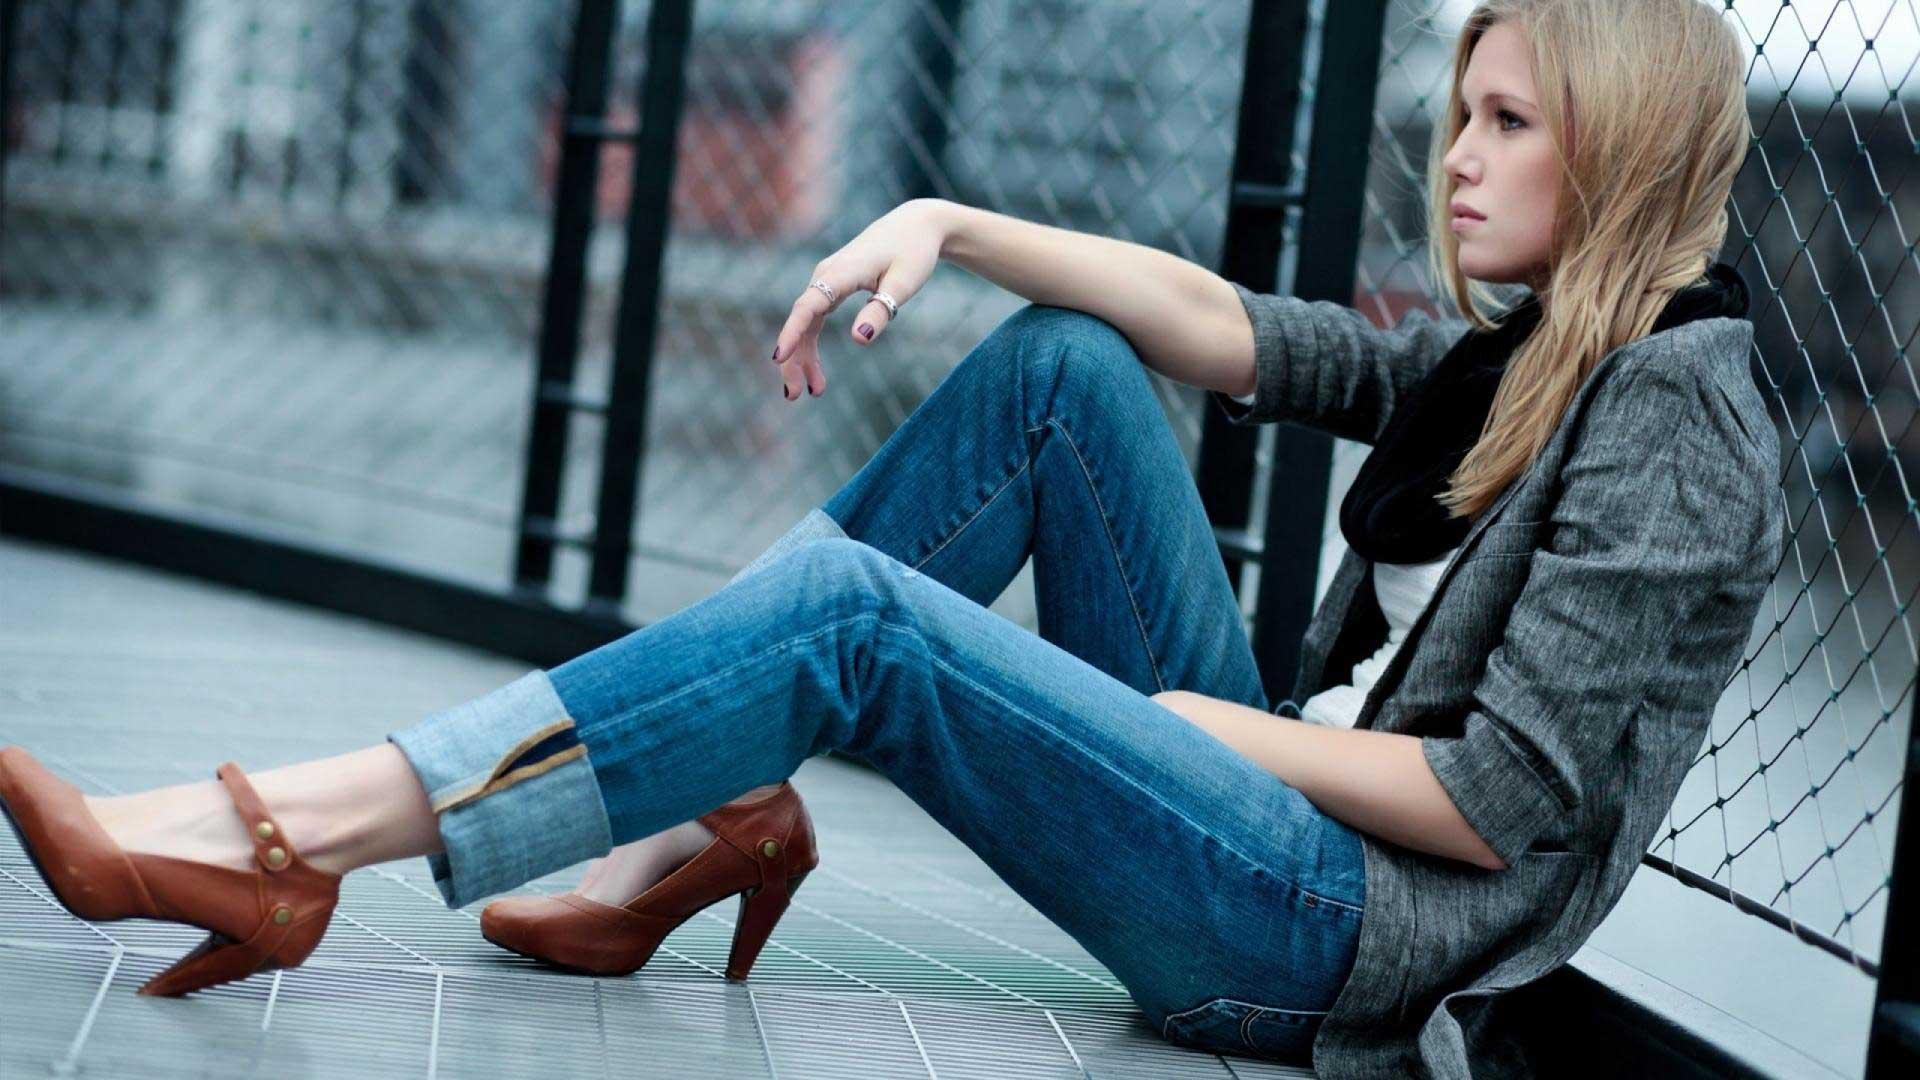 Modelos De Ropas En Jeans Archives Mujer Chic